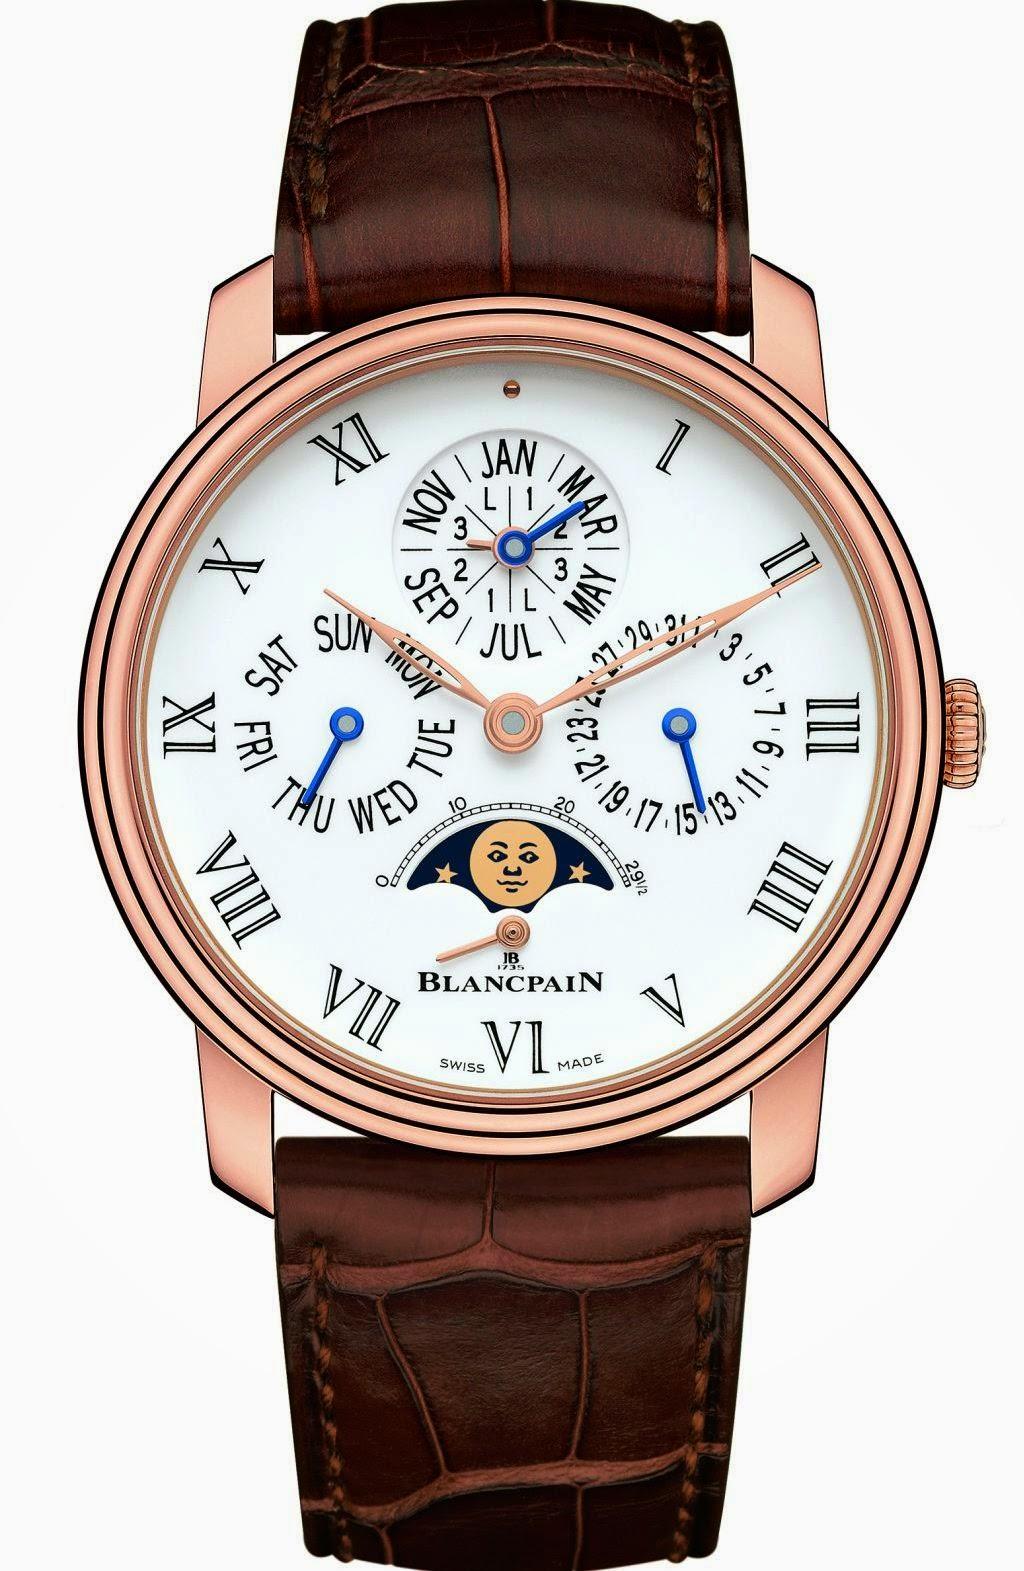 Blancpain Villeret Perpetual Calendar watch replica